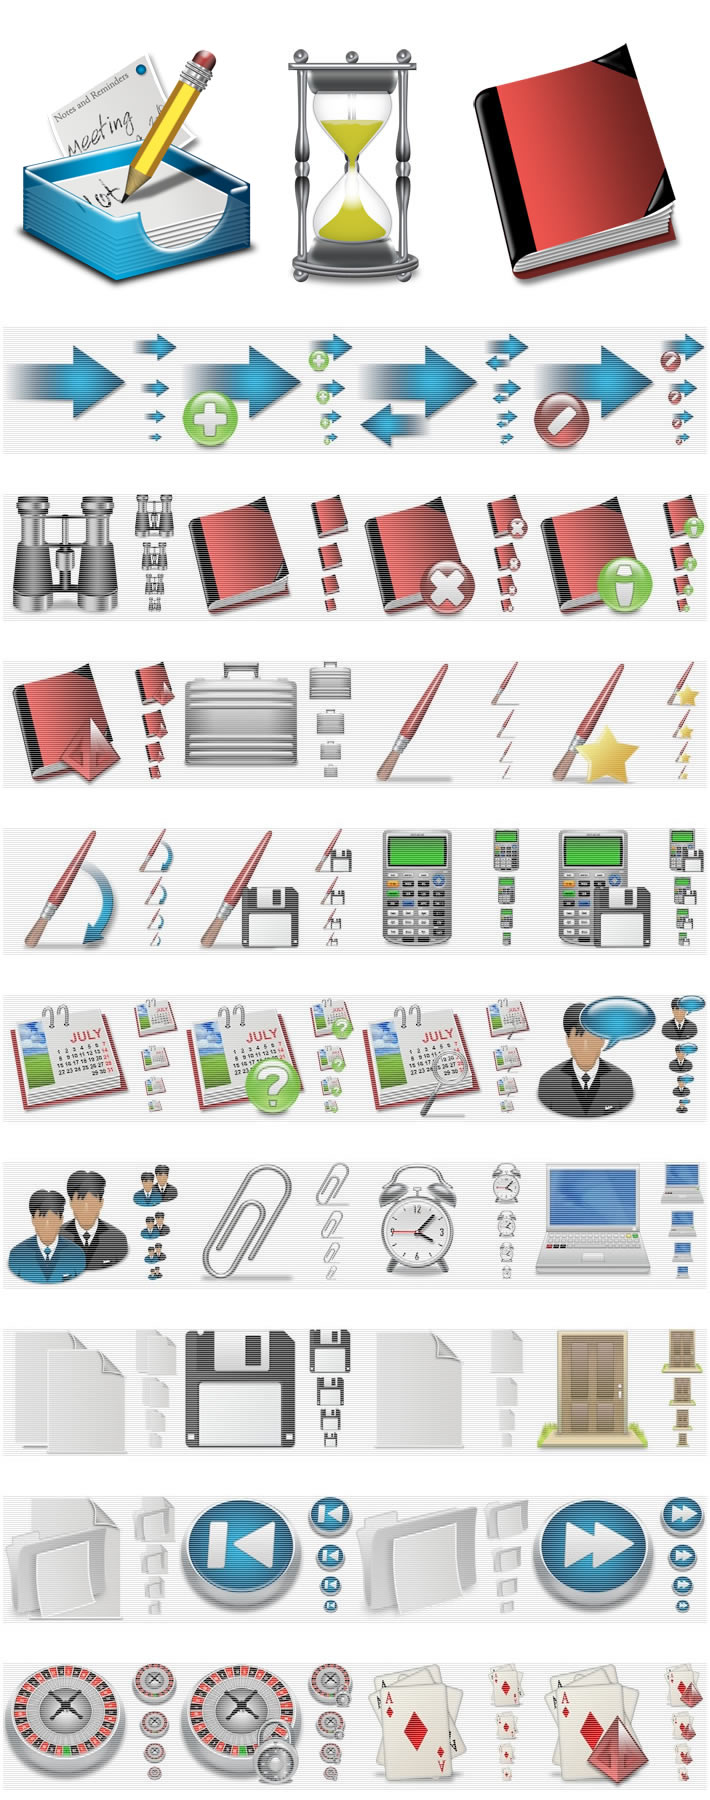 X-MAC 1500 MAC style application icons